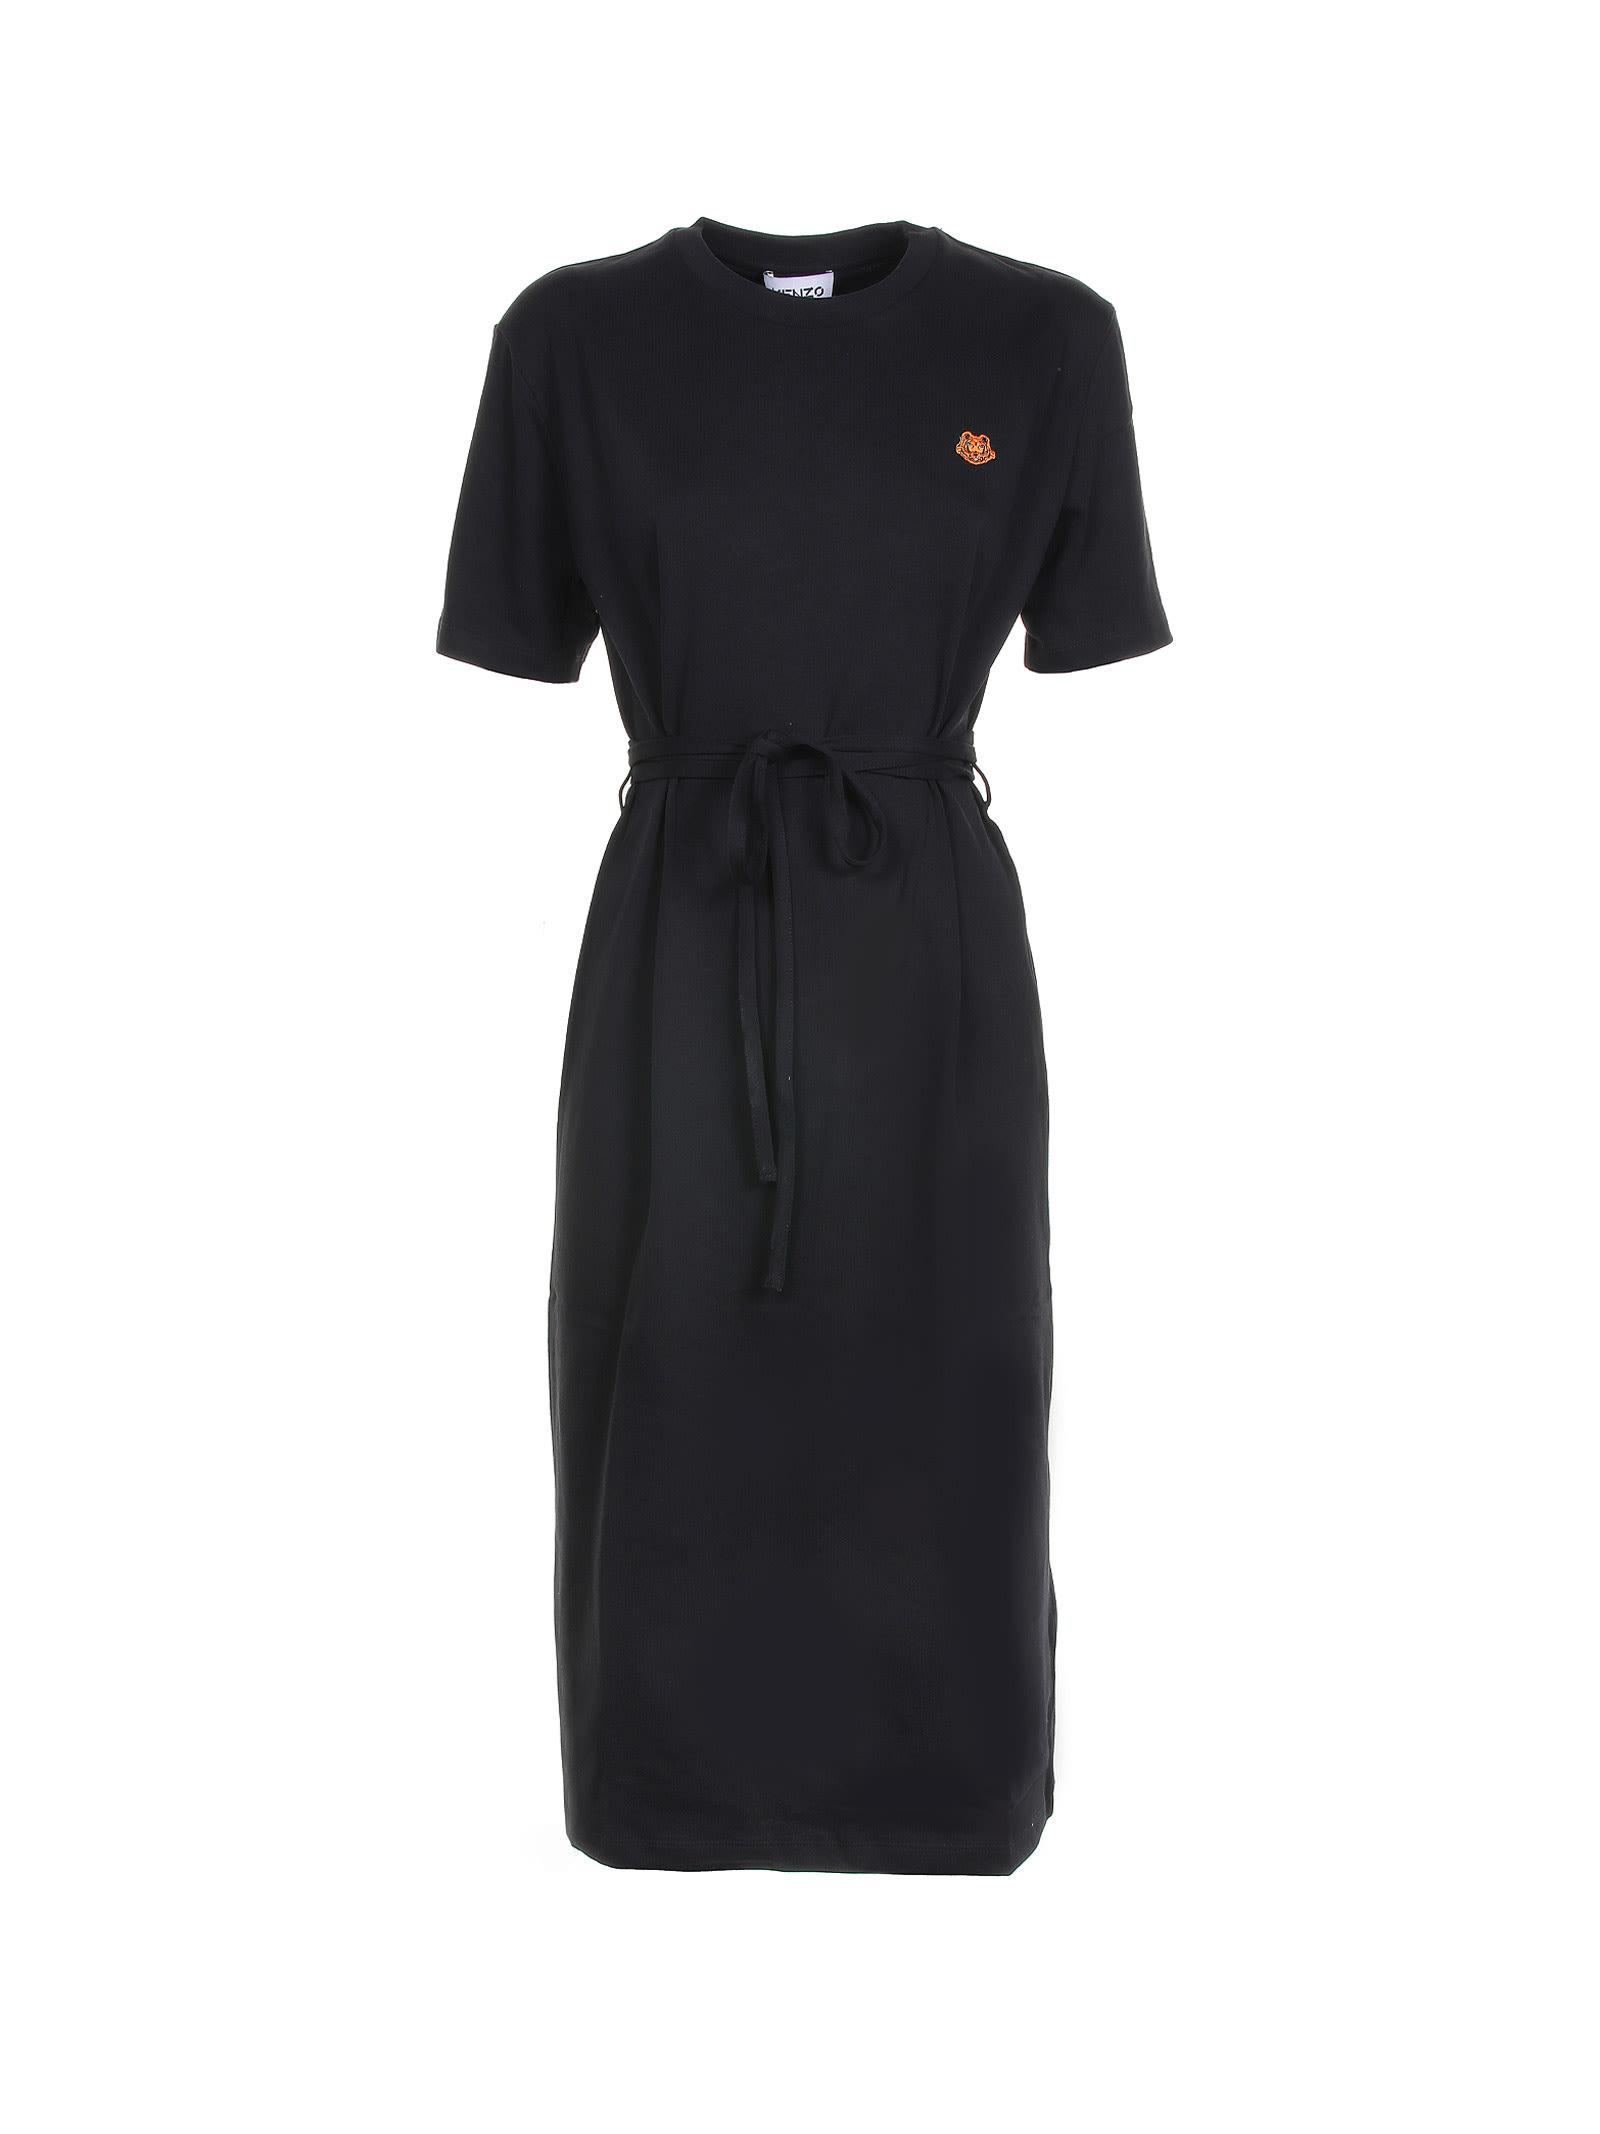 Buy Kenzo Kenzo Tiger Crest T-shirt Dress online, shop Kenzo with free shipping